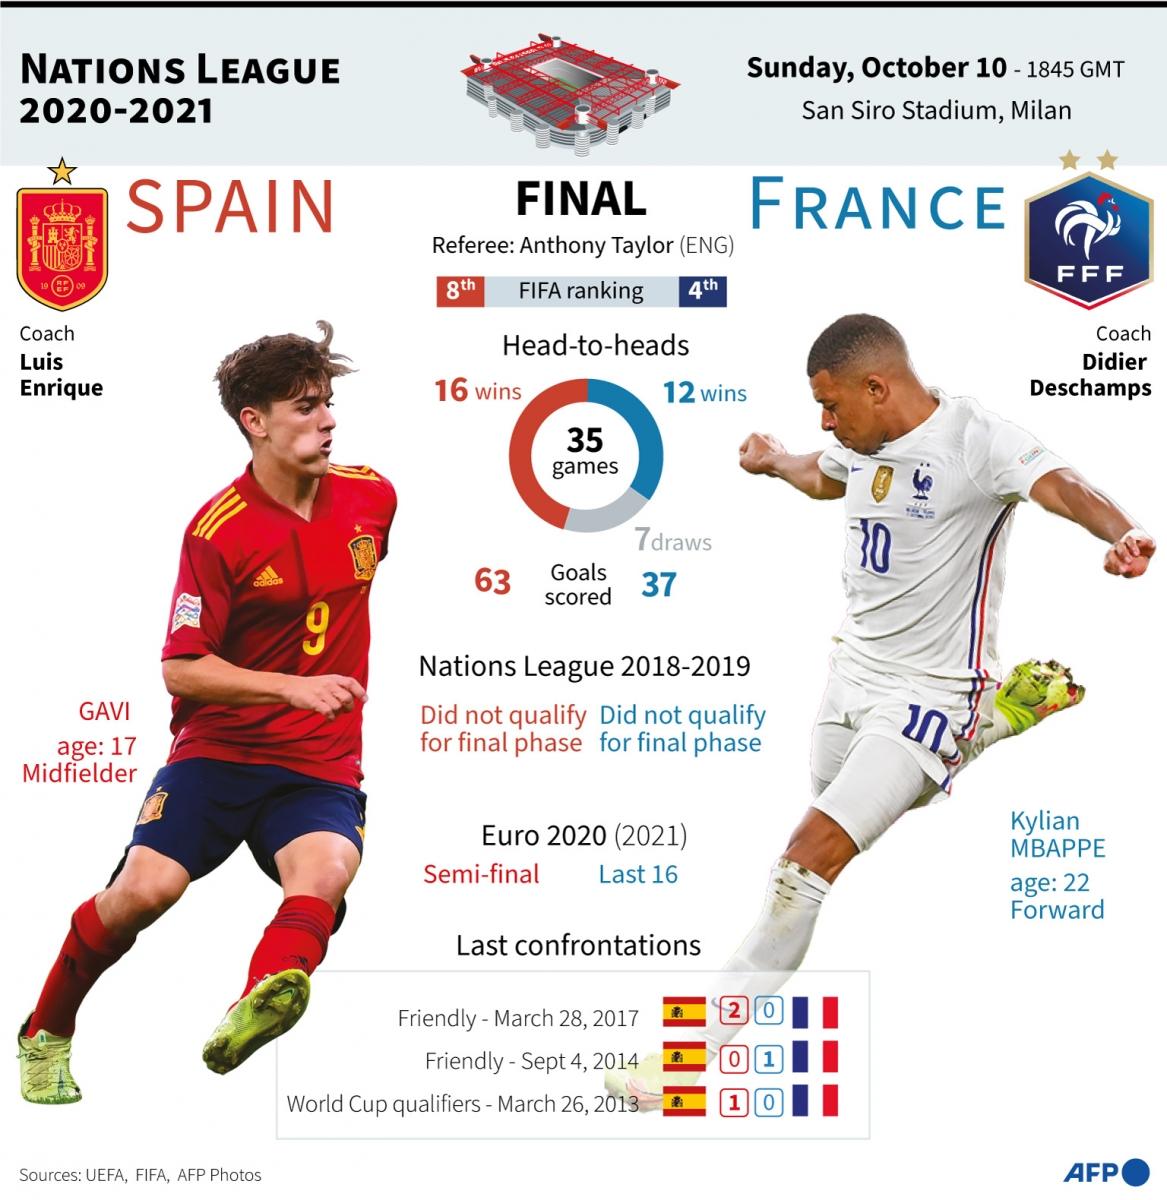 Испания – Франция. Кто выиграет Лигу наций?